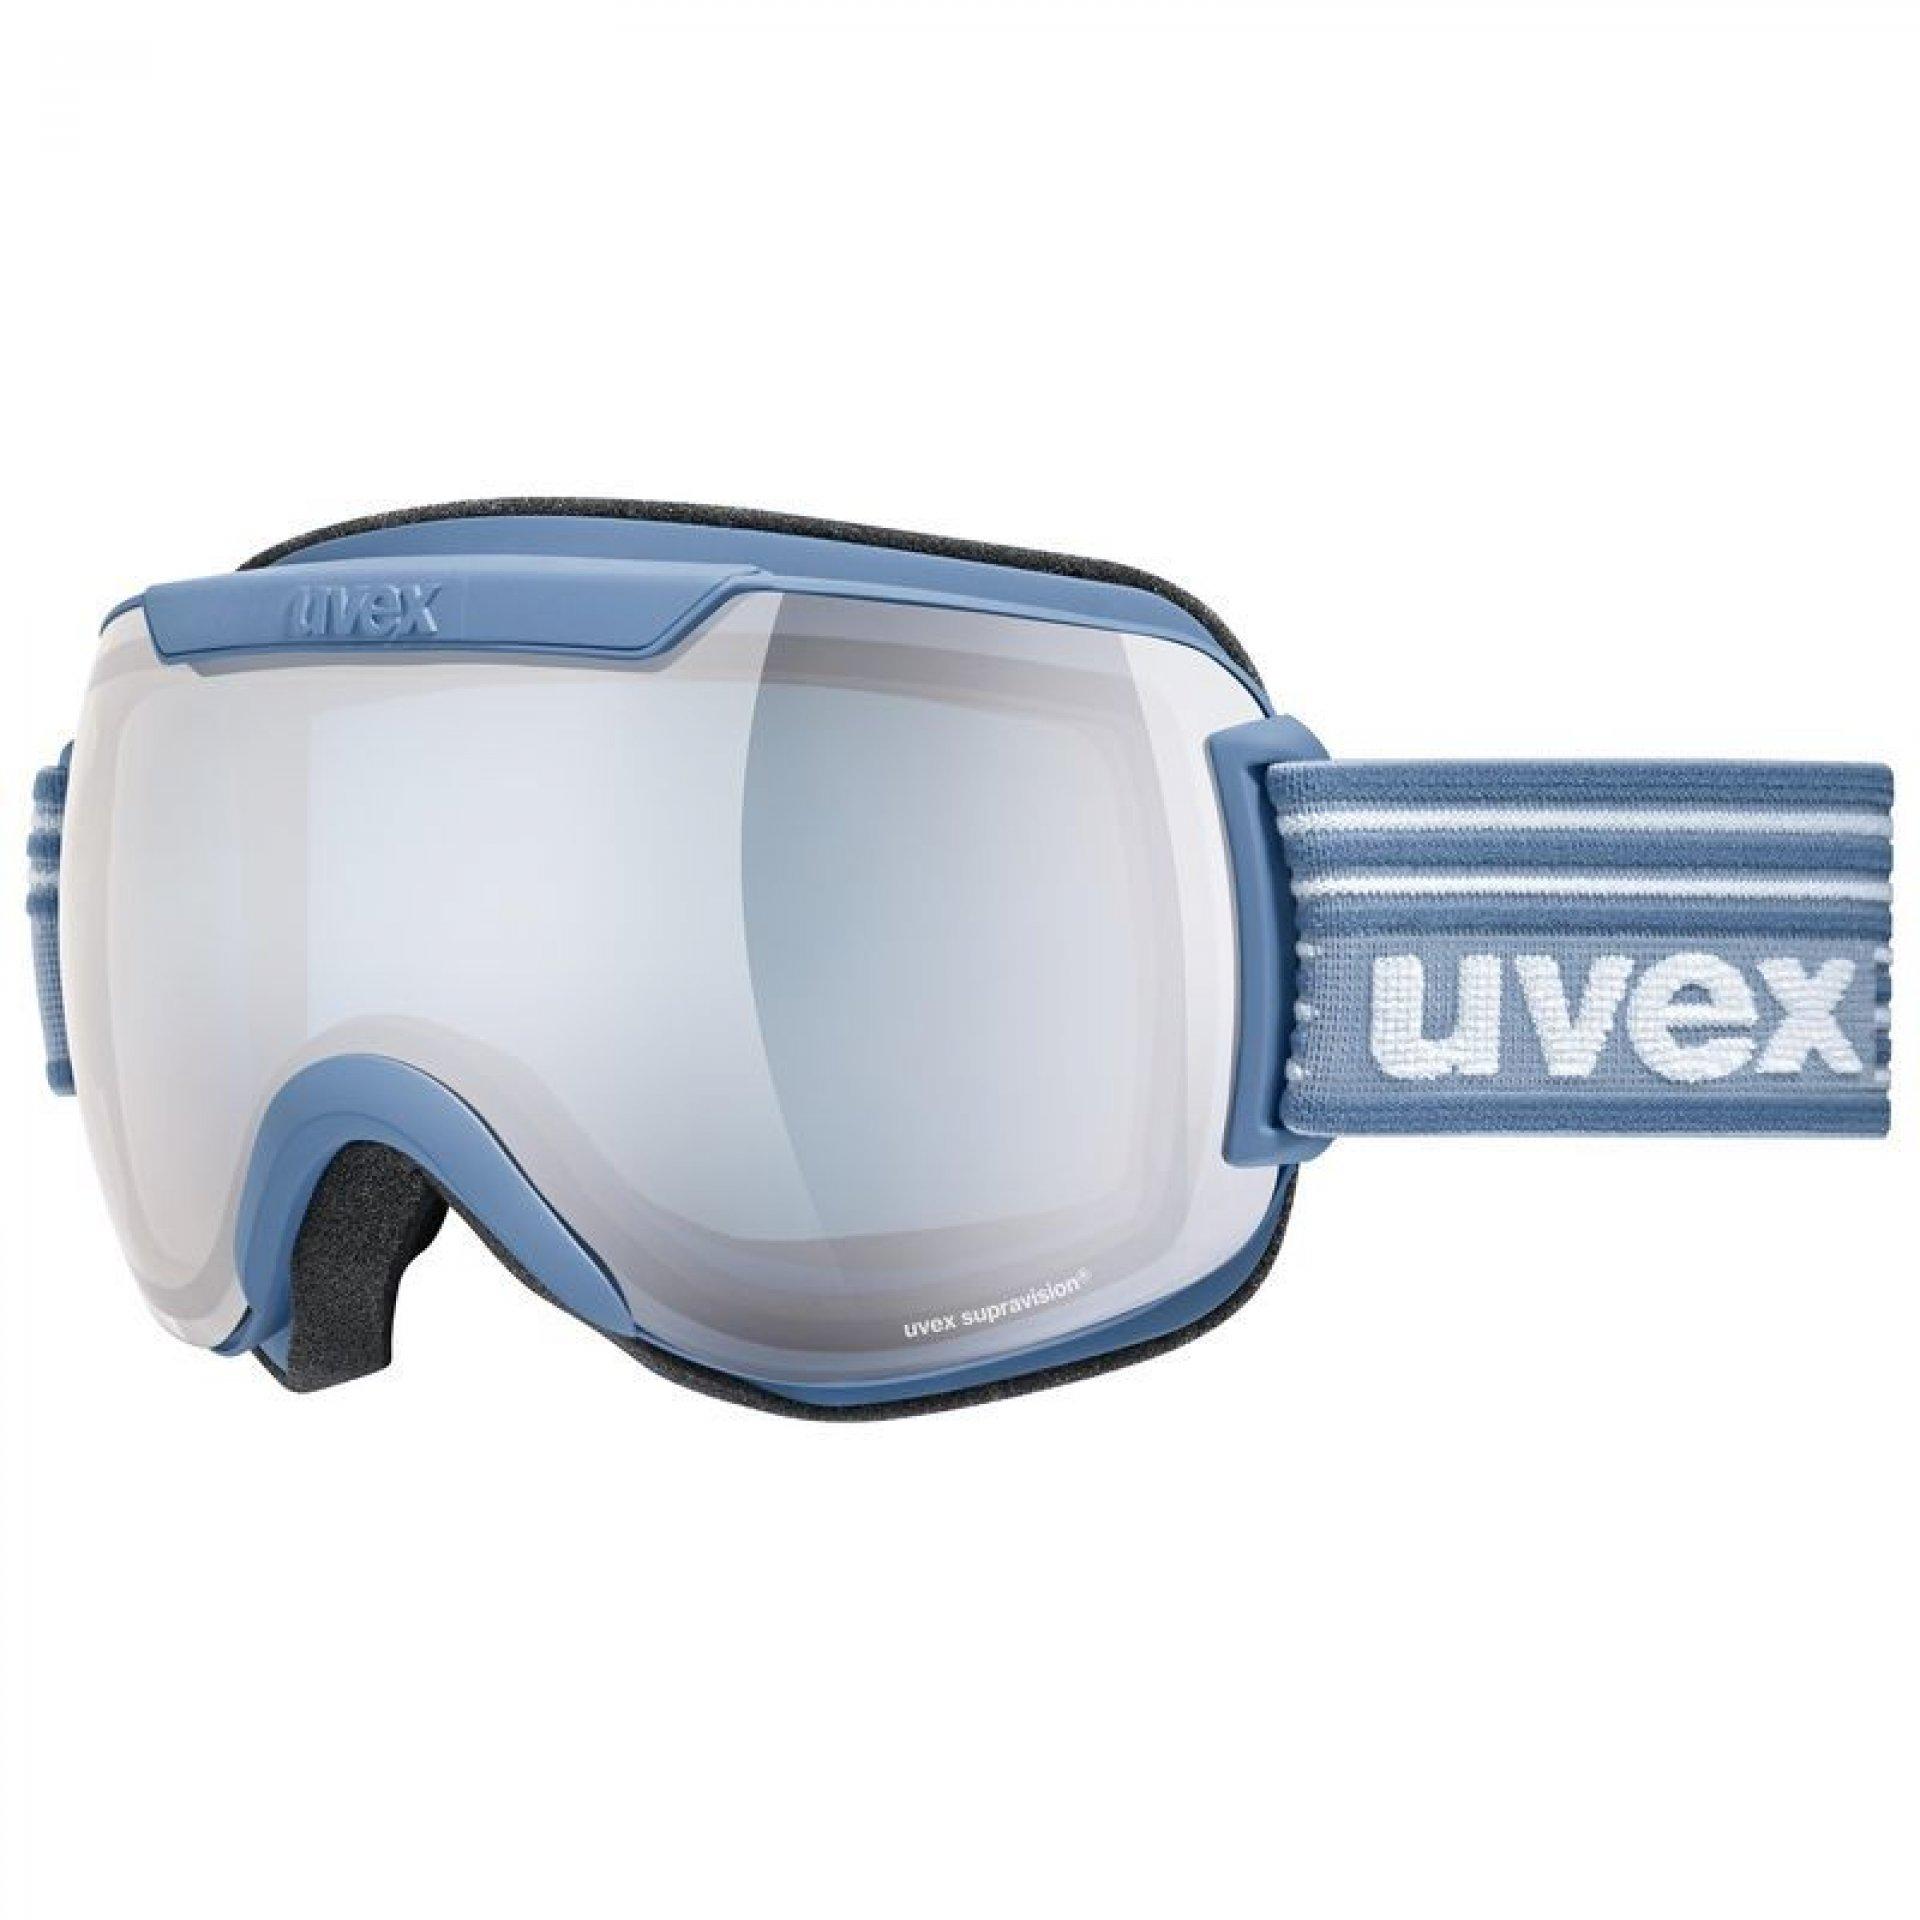 GOGLE UVEX DOWNHILL 2000 FM LAGUNE MAT MIRROR SILVER BLUE 55 0 1154030